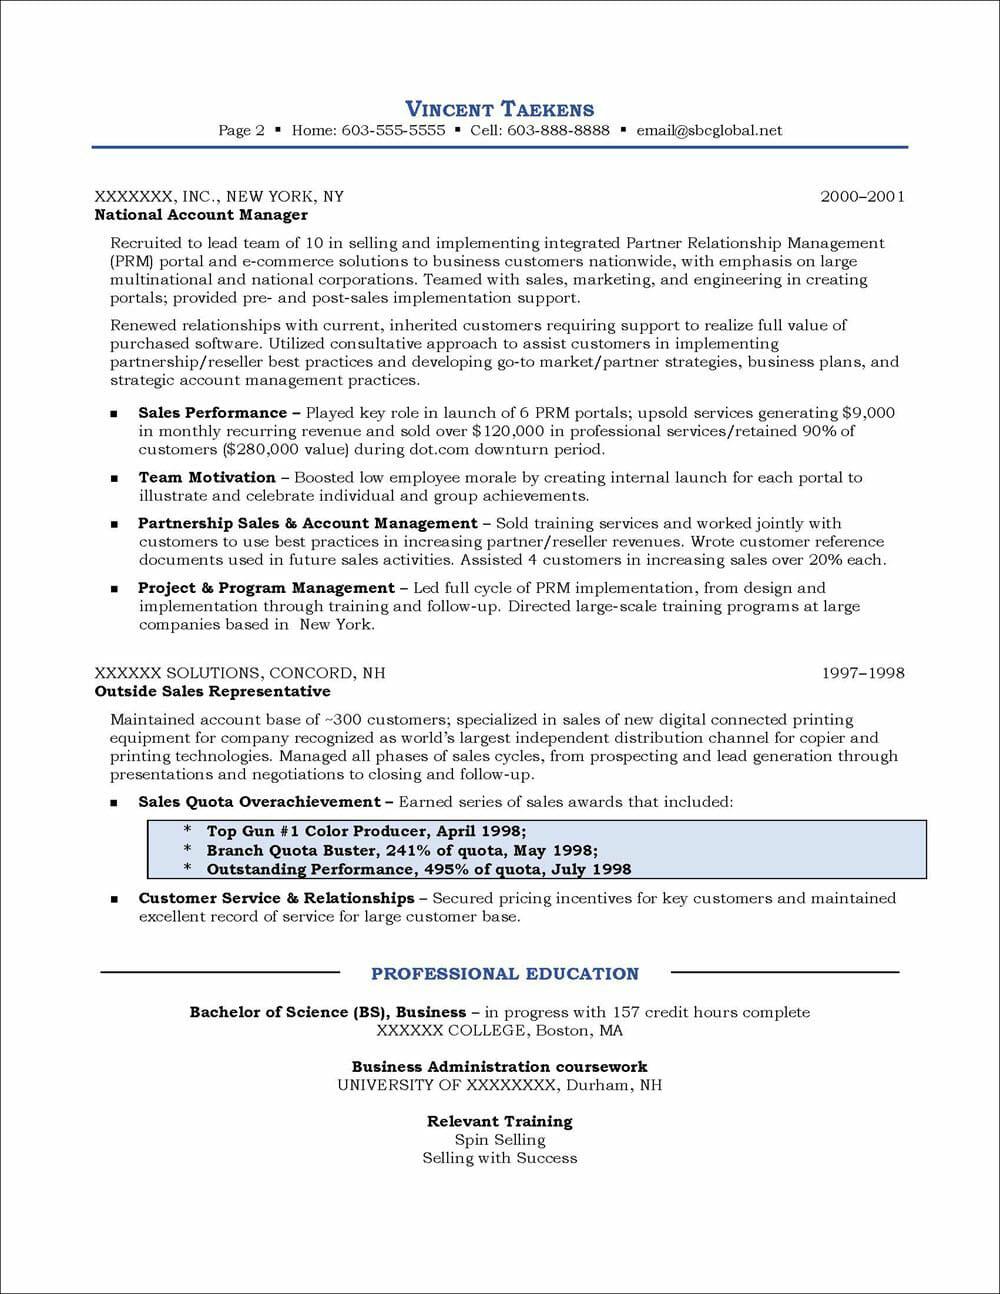 Distinctive resume